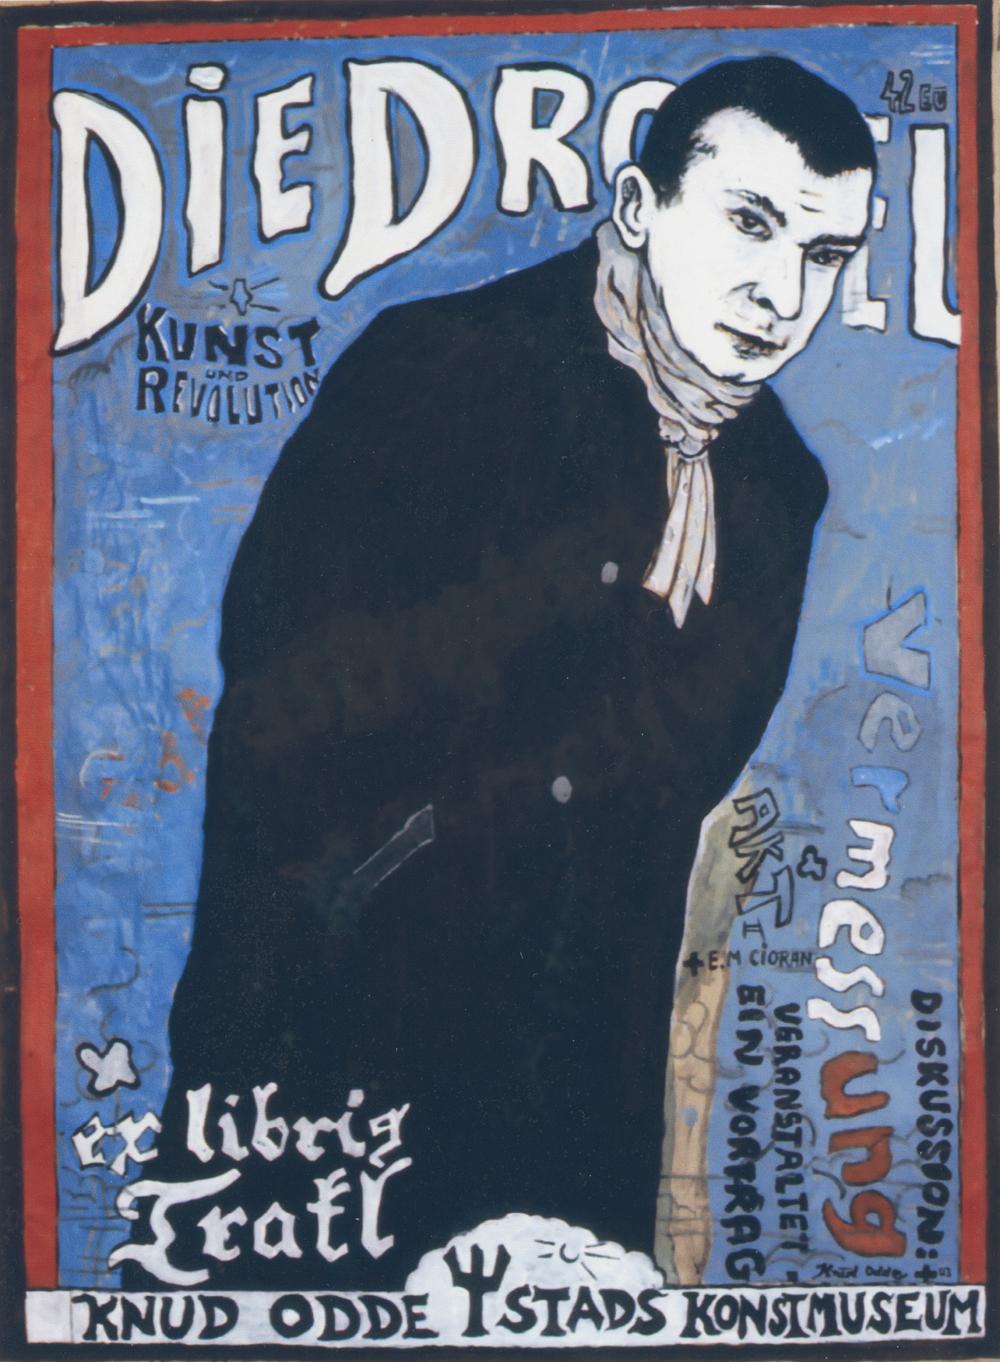 Knud Odde Ystads konstmuseum – kunst und revolution